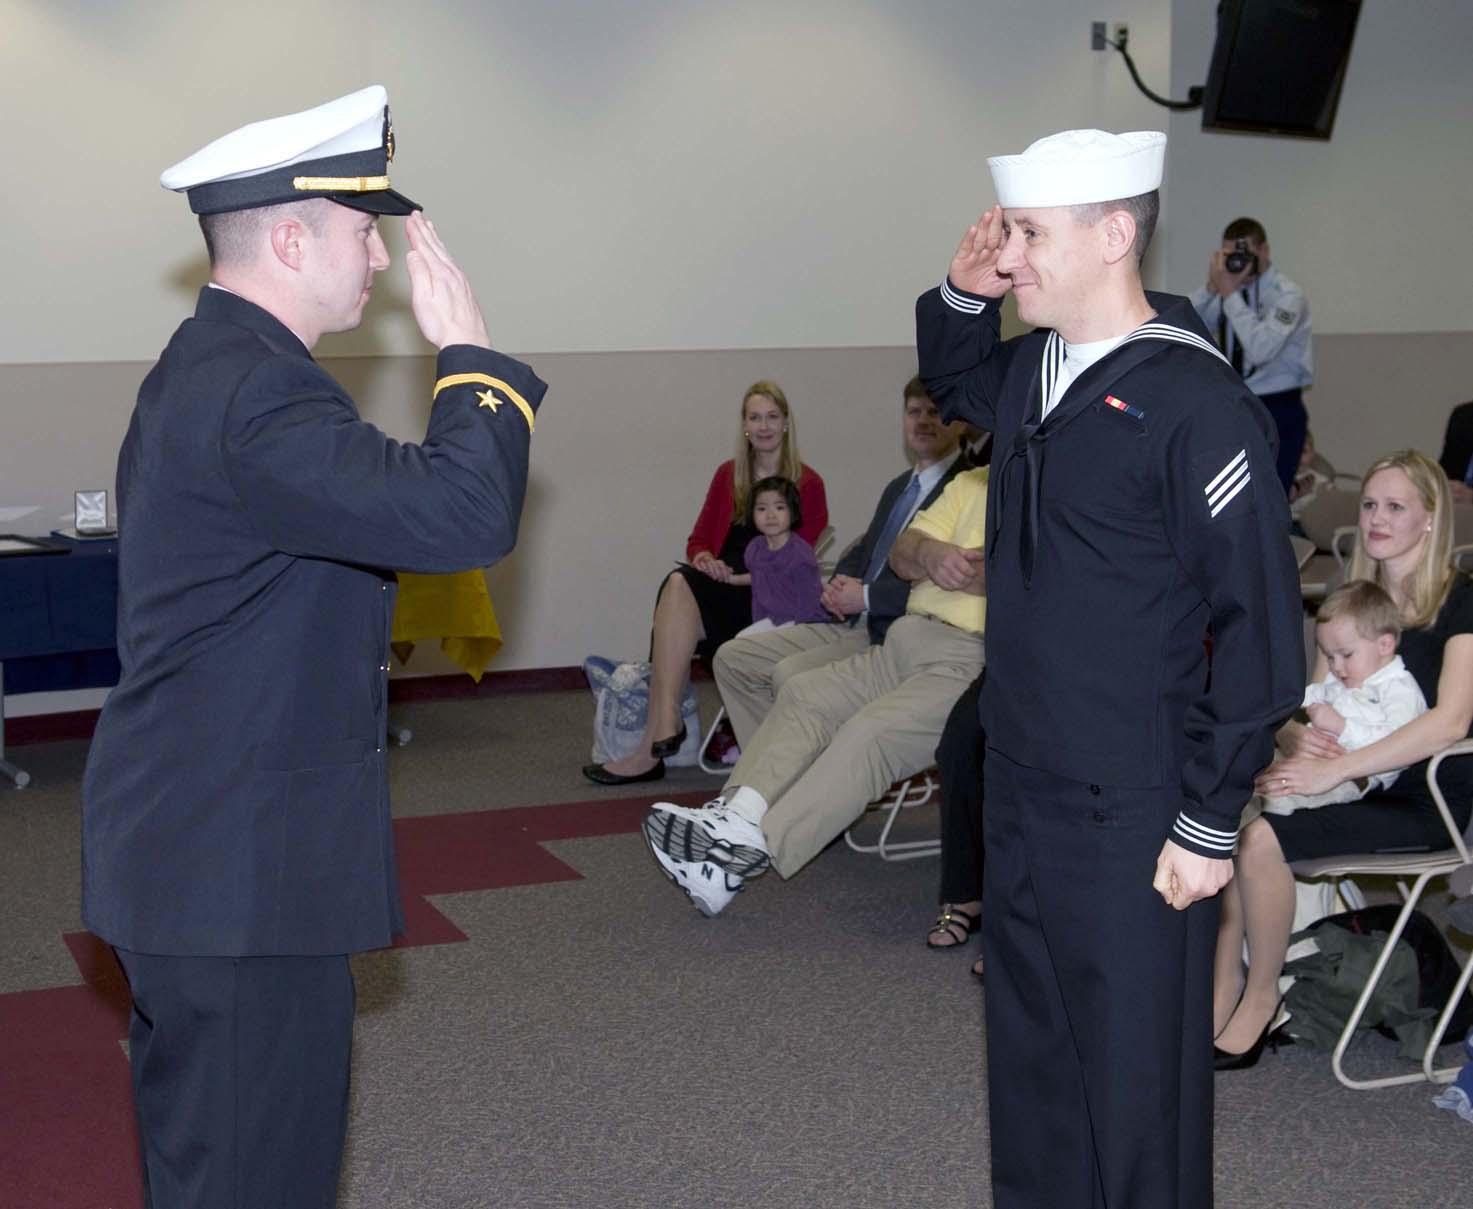 Navy Rdc Yelling